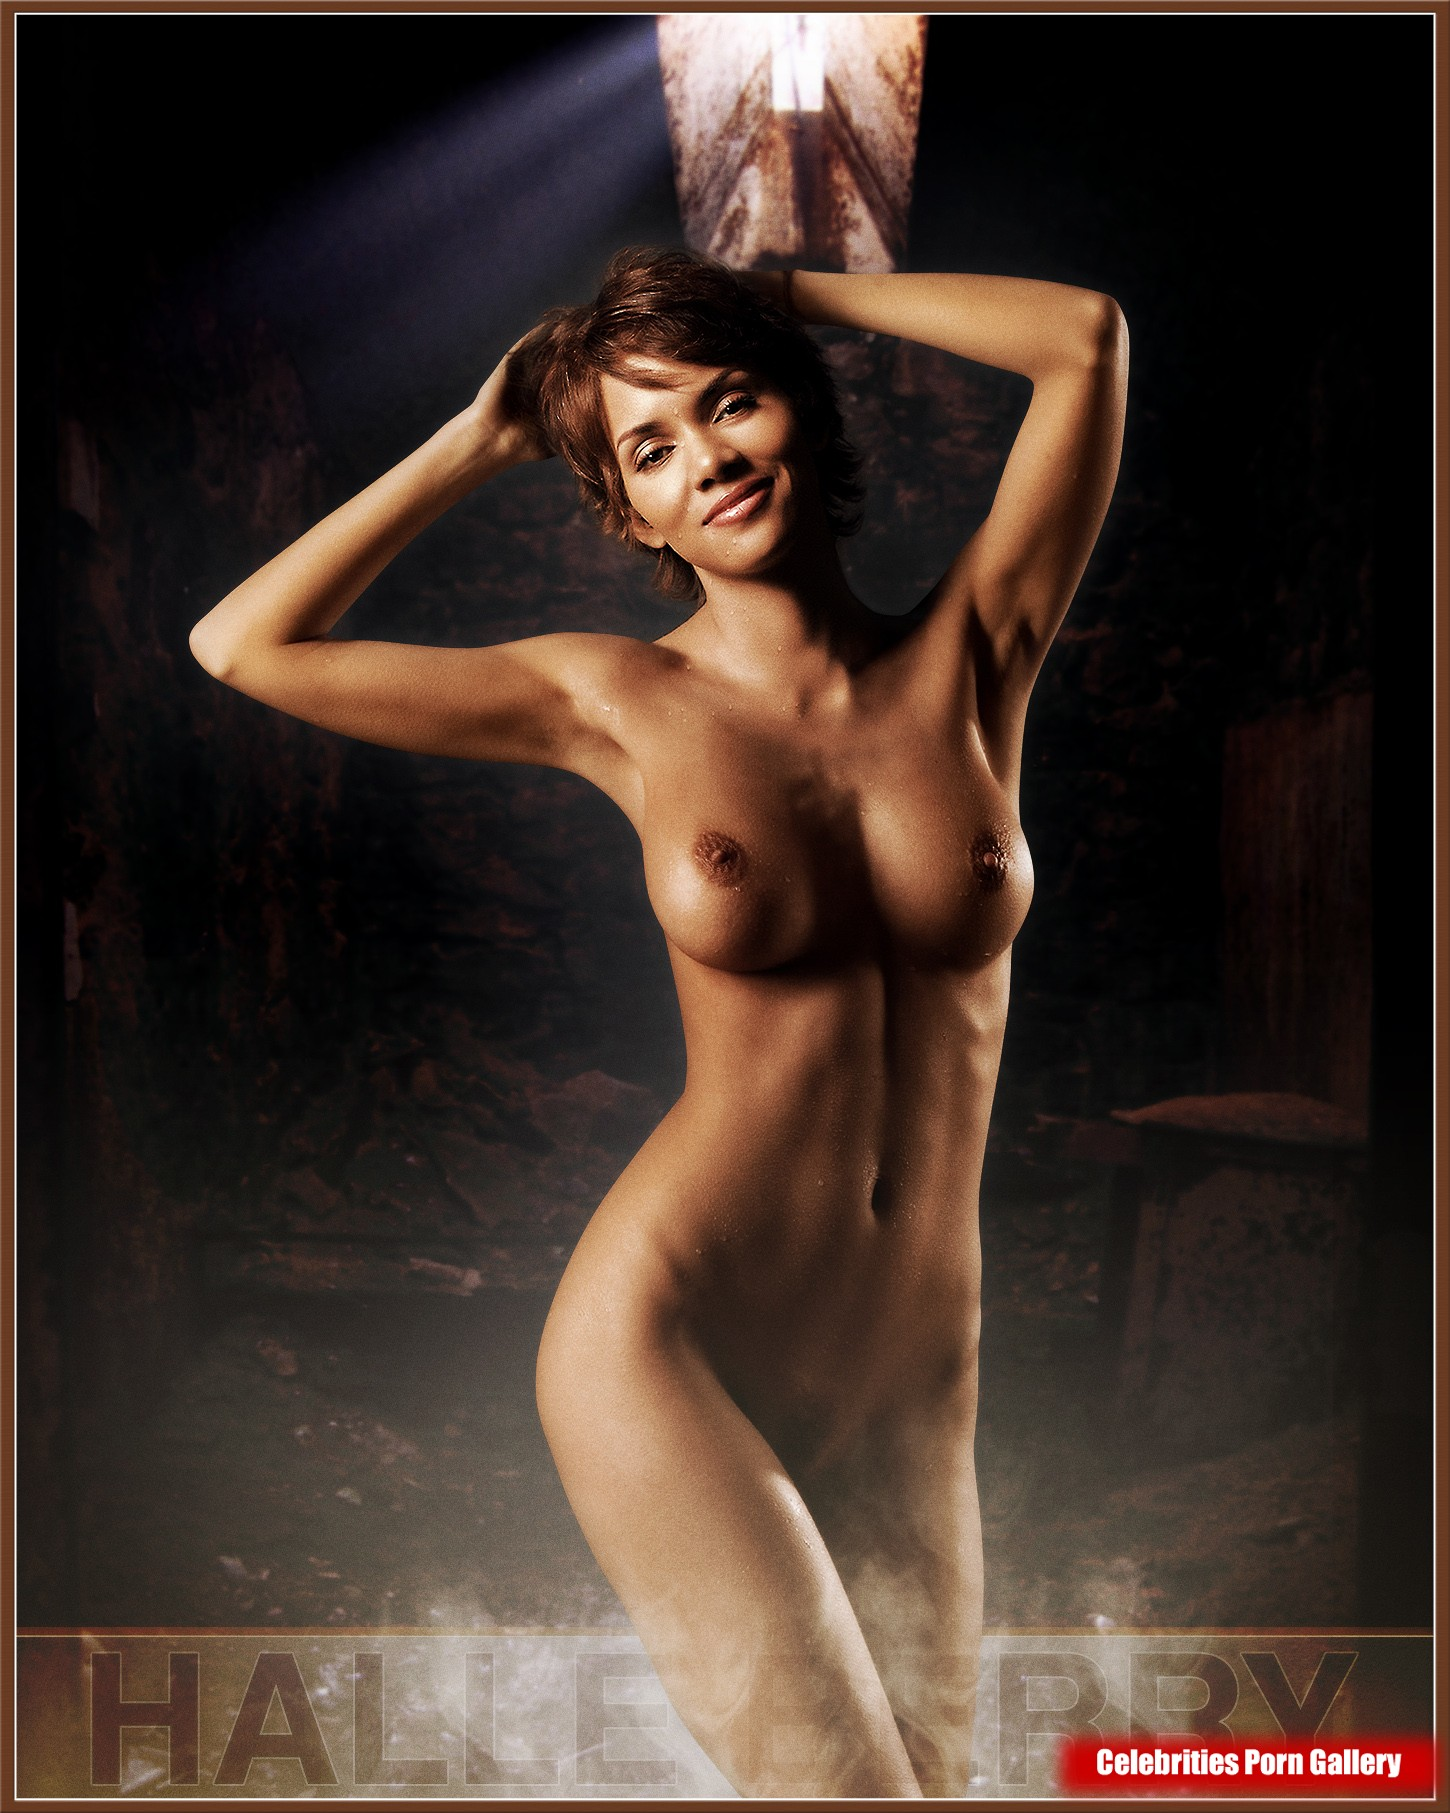 Холли берри фото голая